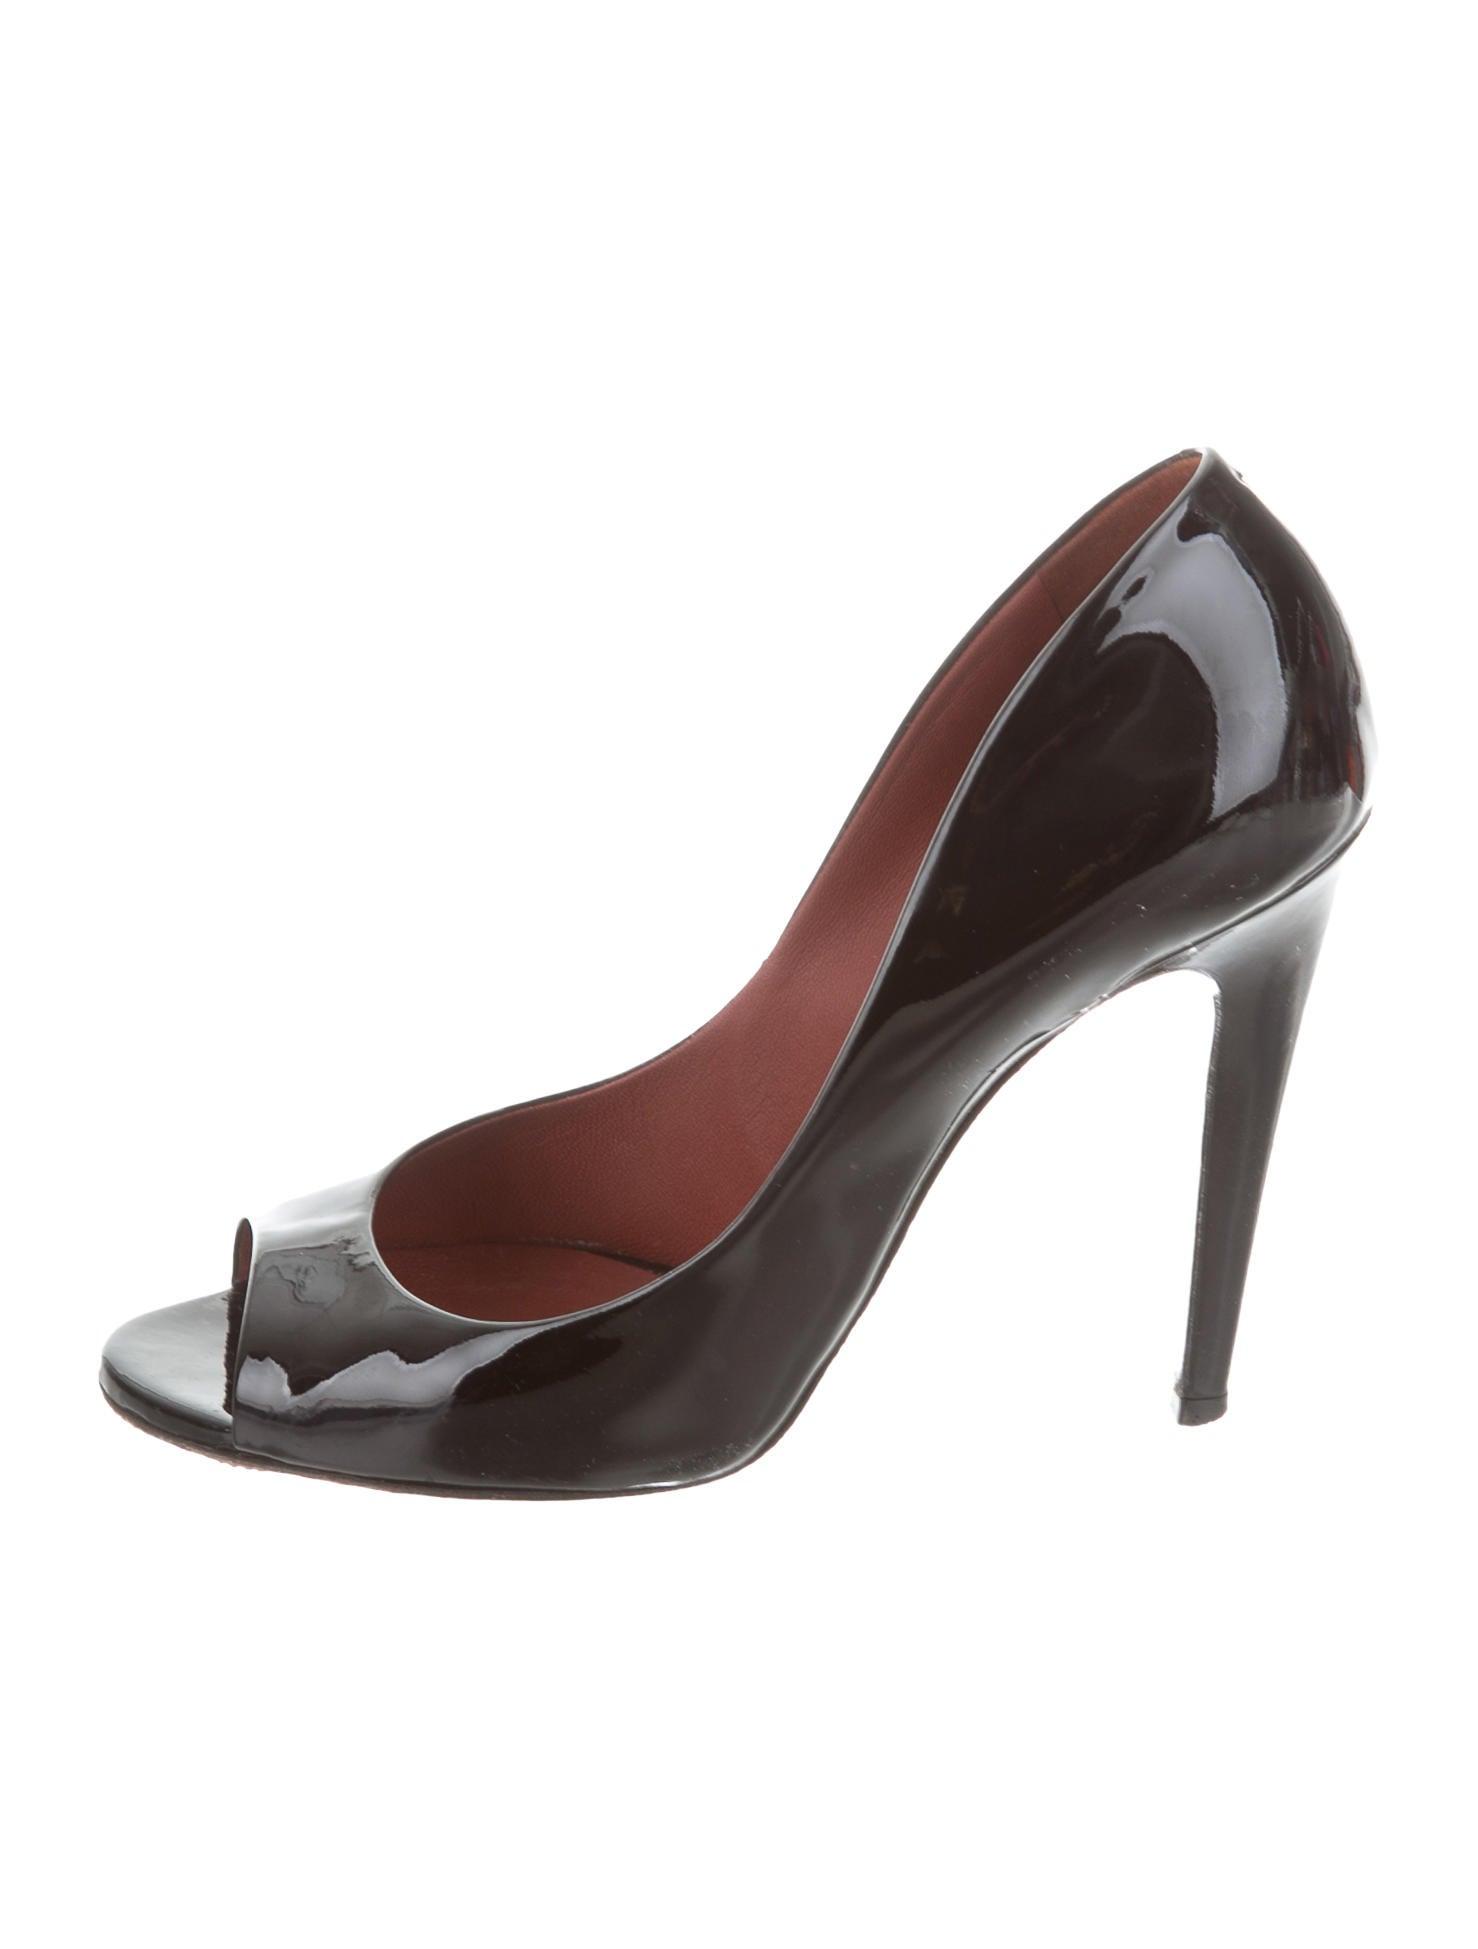 Bottega Veneta Peep-Toe Patent Leather Pumps discount release dates sale enjoy lfmtqPP